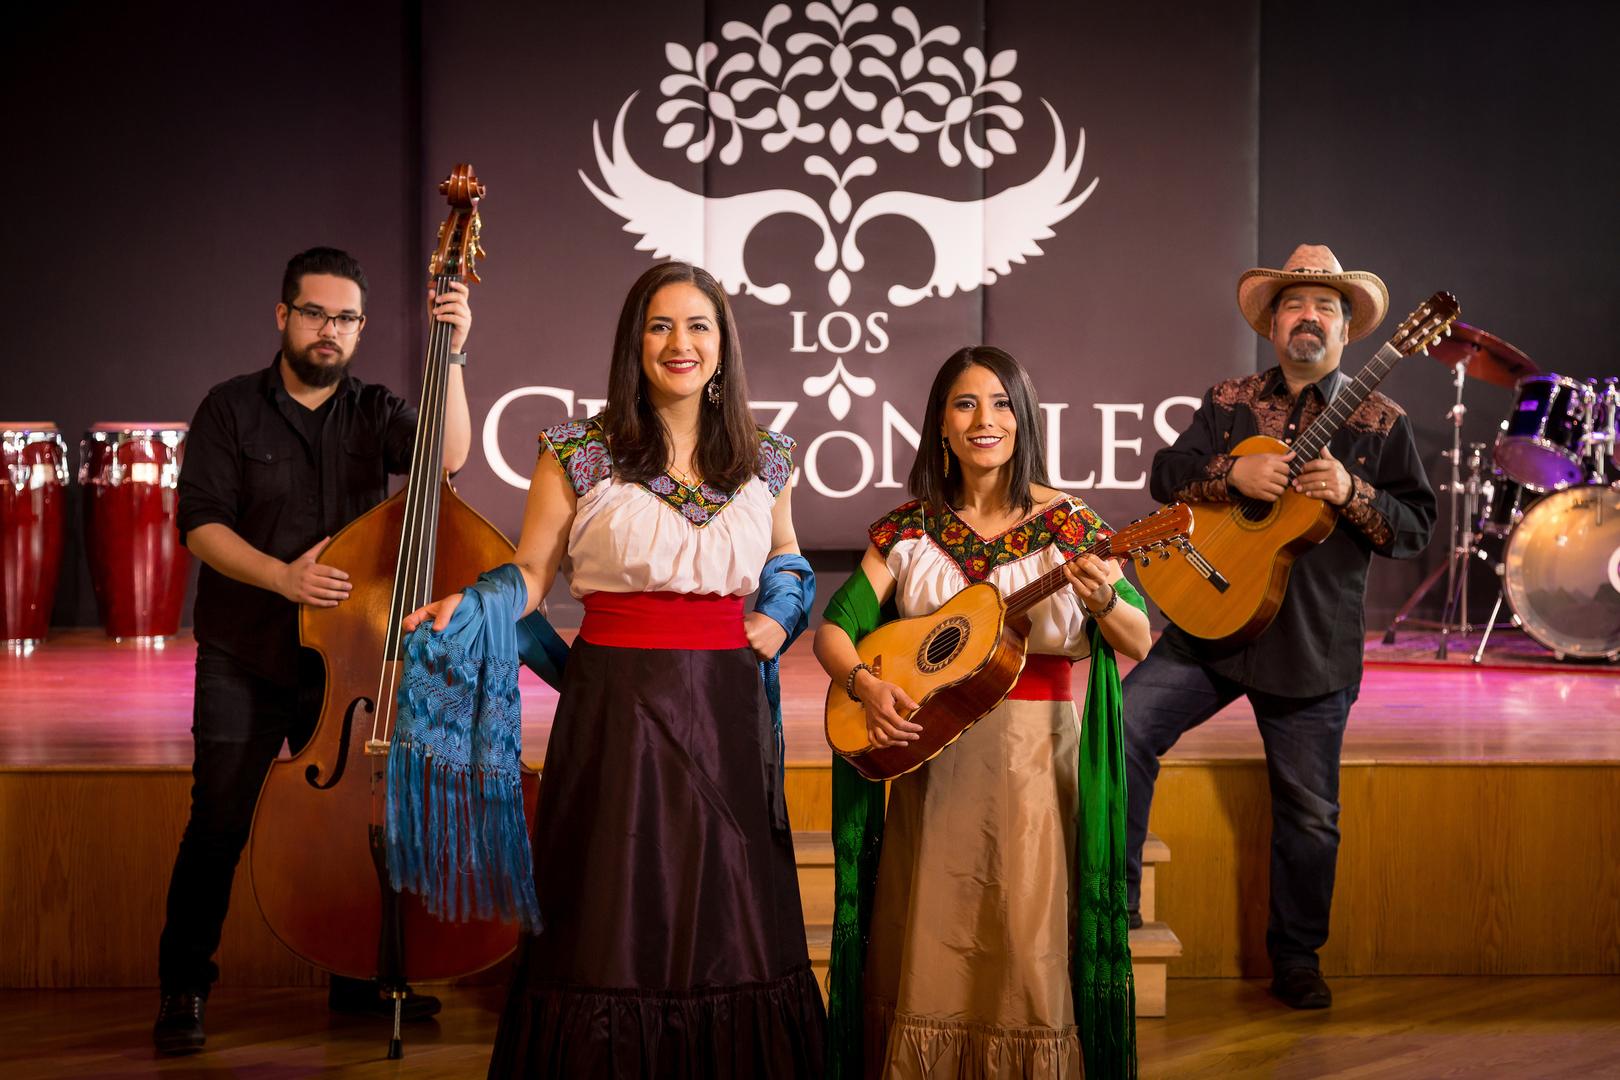 Celebrando la Cultura: Los Cenzontles in Watsonville